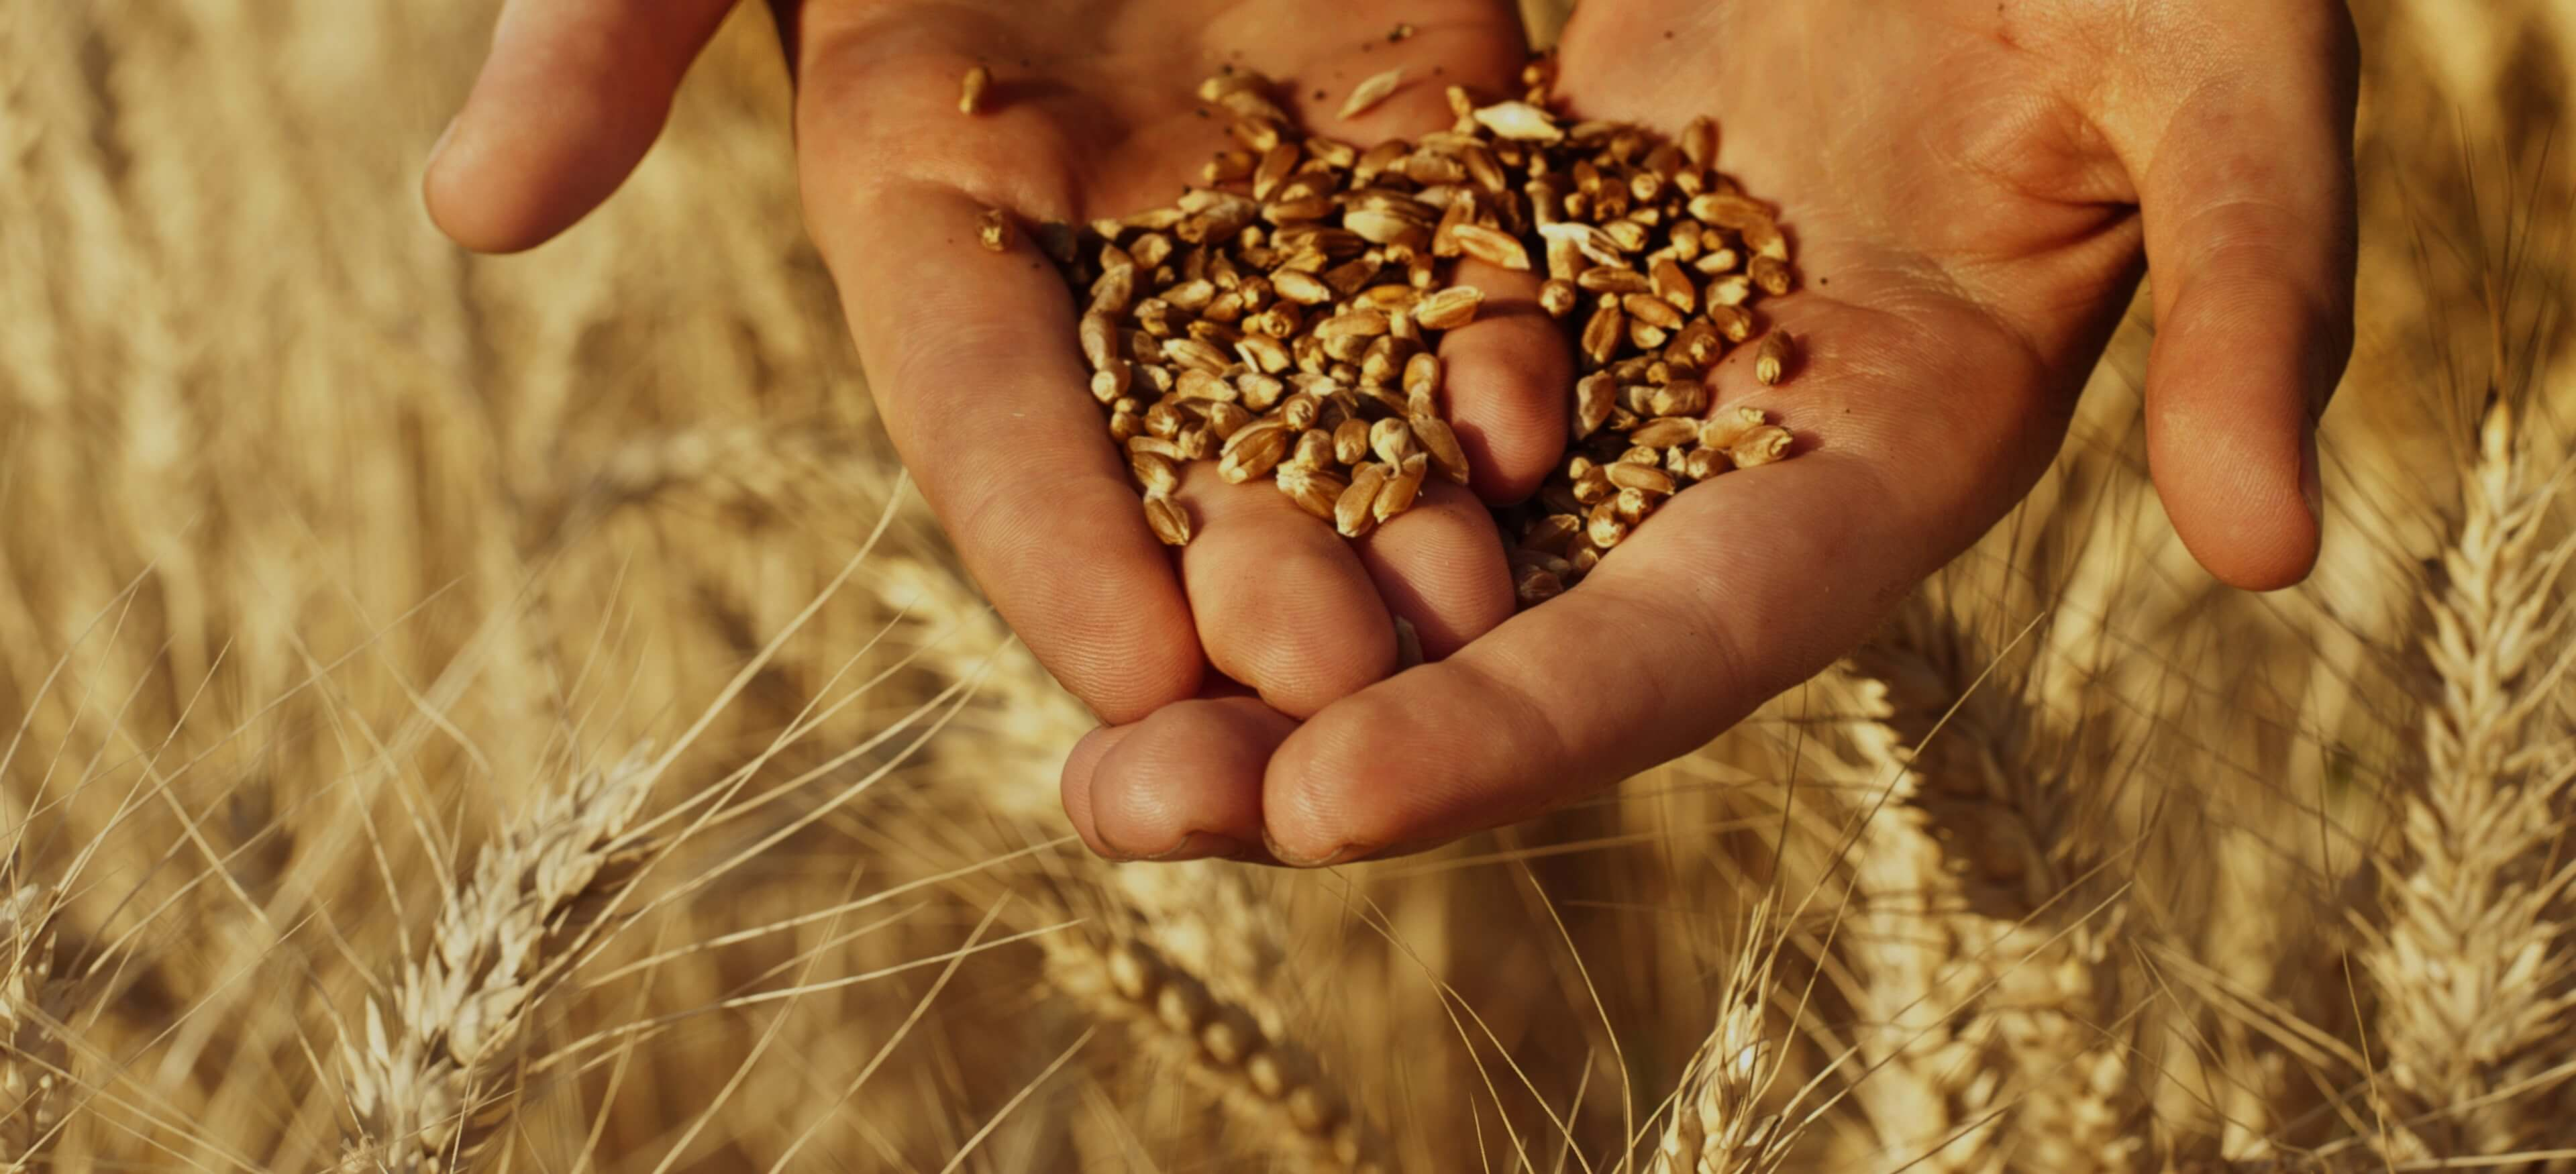 Decortiqueuse-epeautre-sarrasin-tournesol-chanvre-millet-orge-quinoa